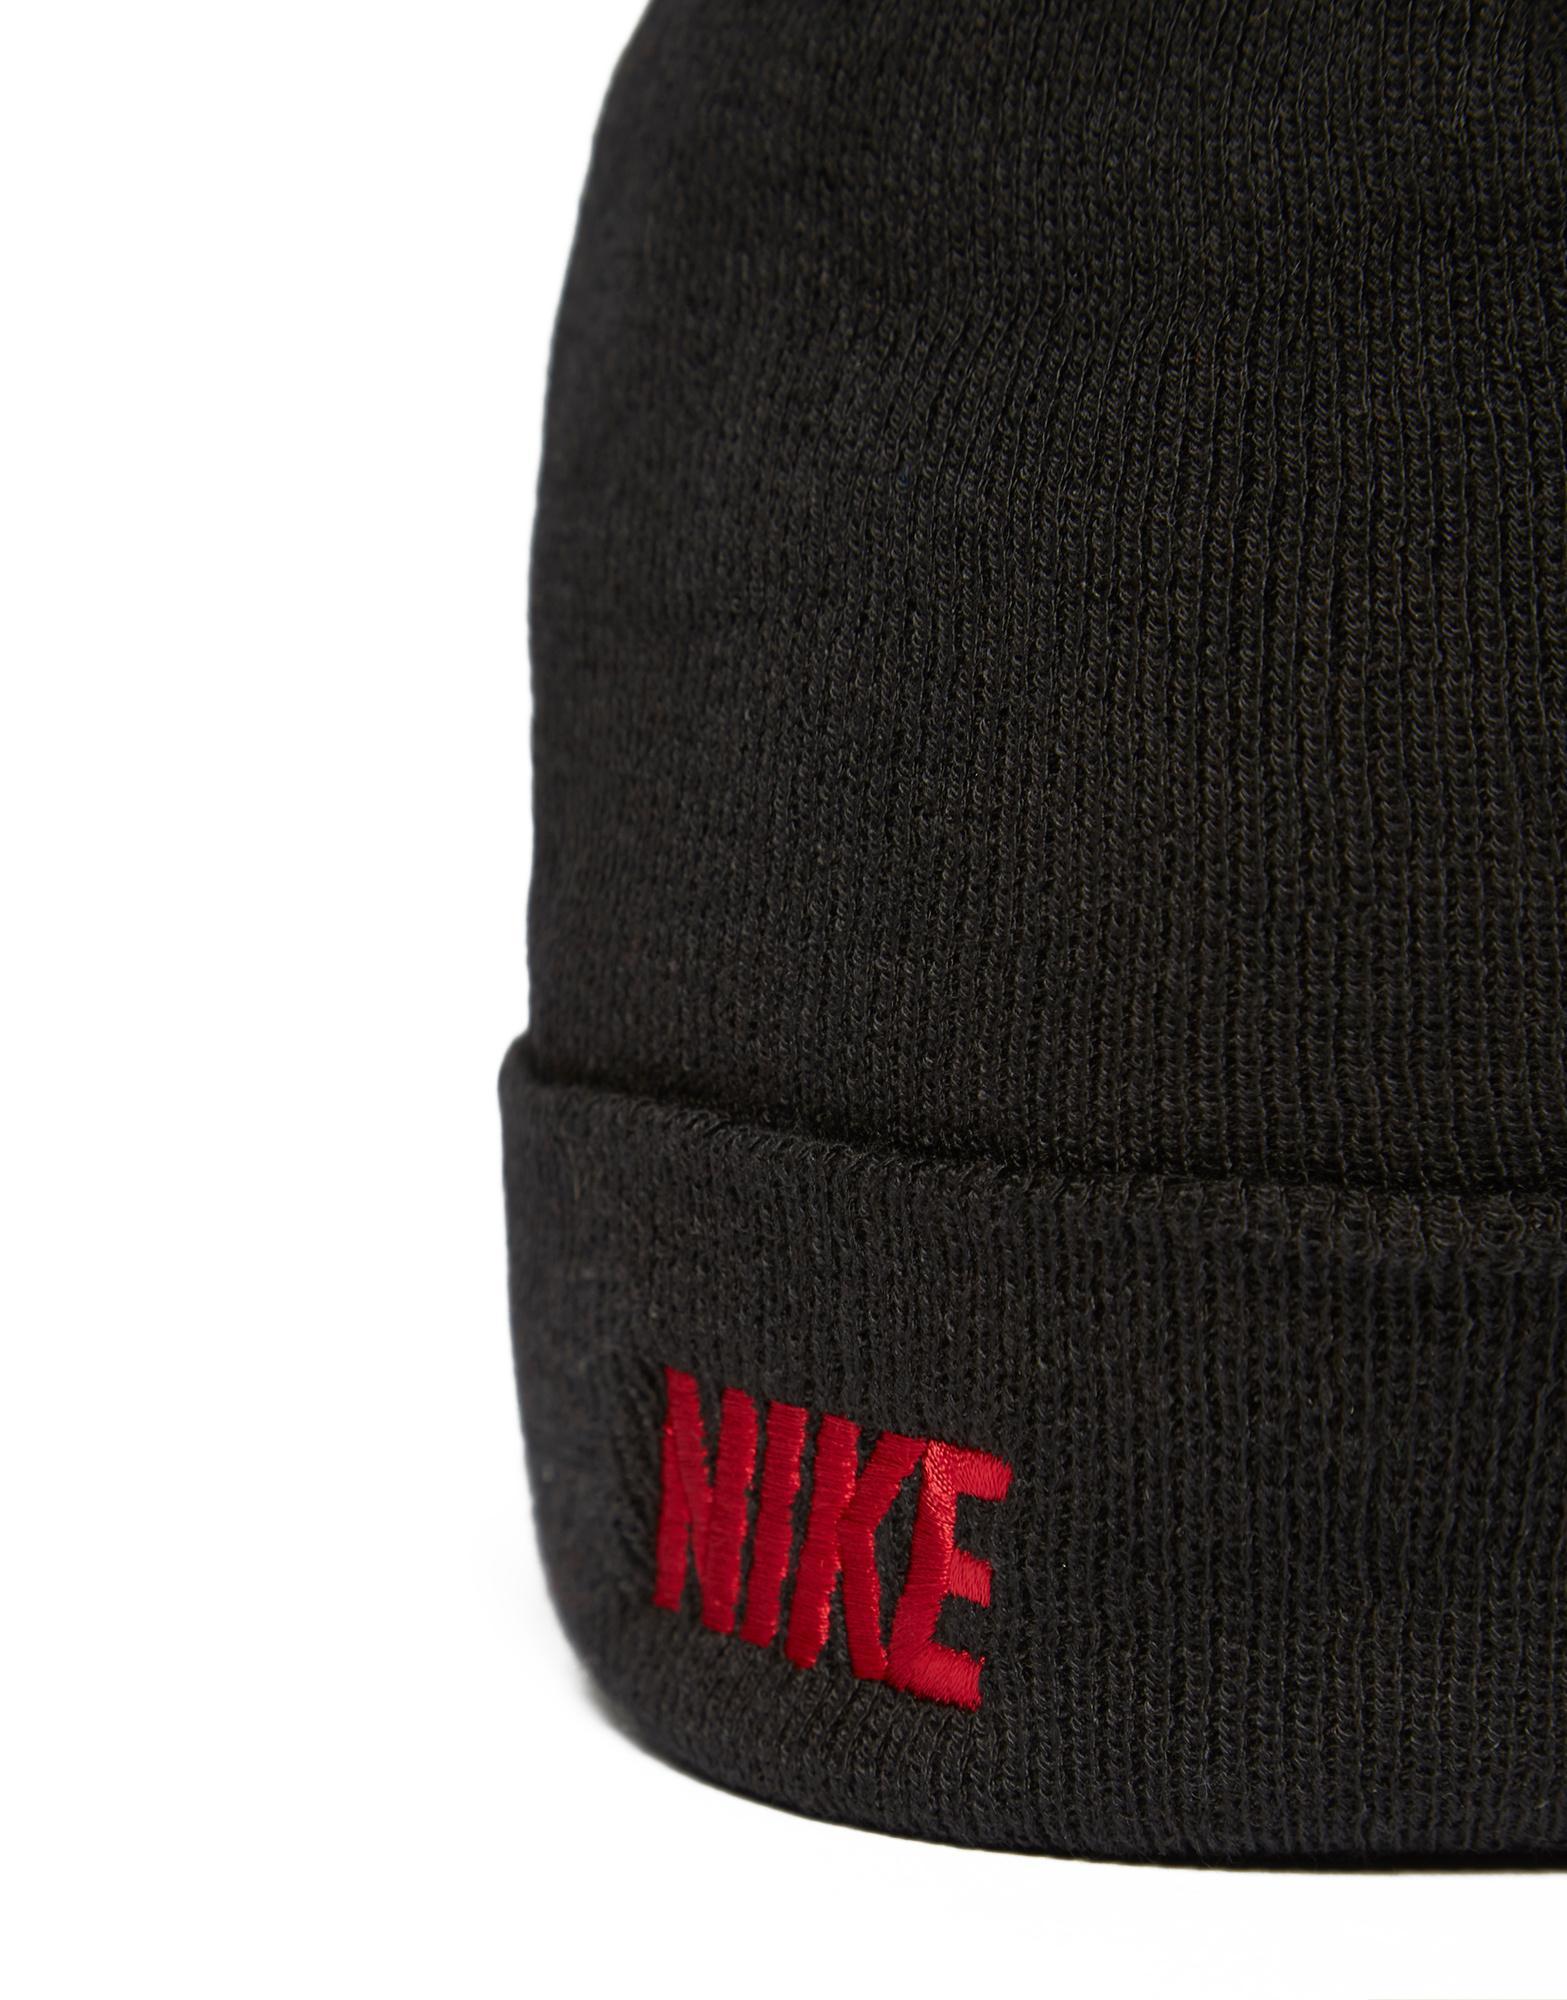 b1b6d416fc5 Nike Iconic Beanie Hat in Black for Men - Lyst